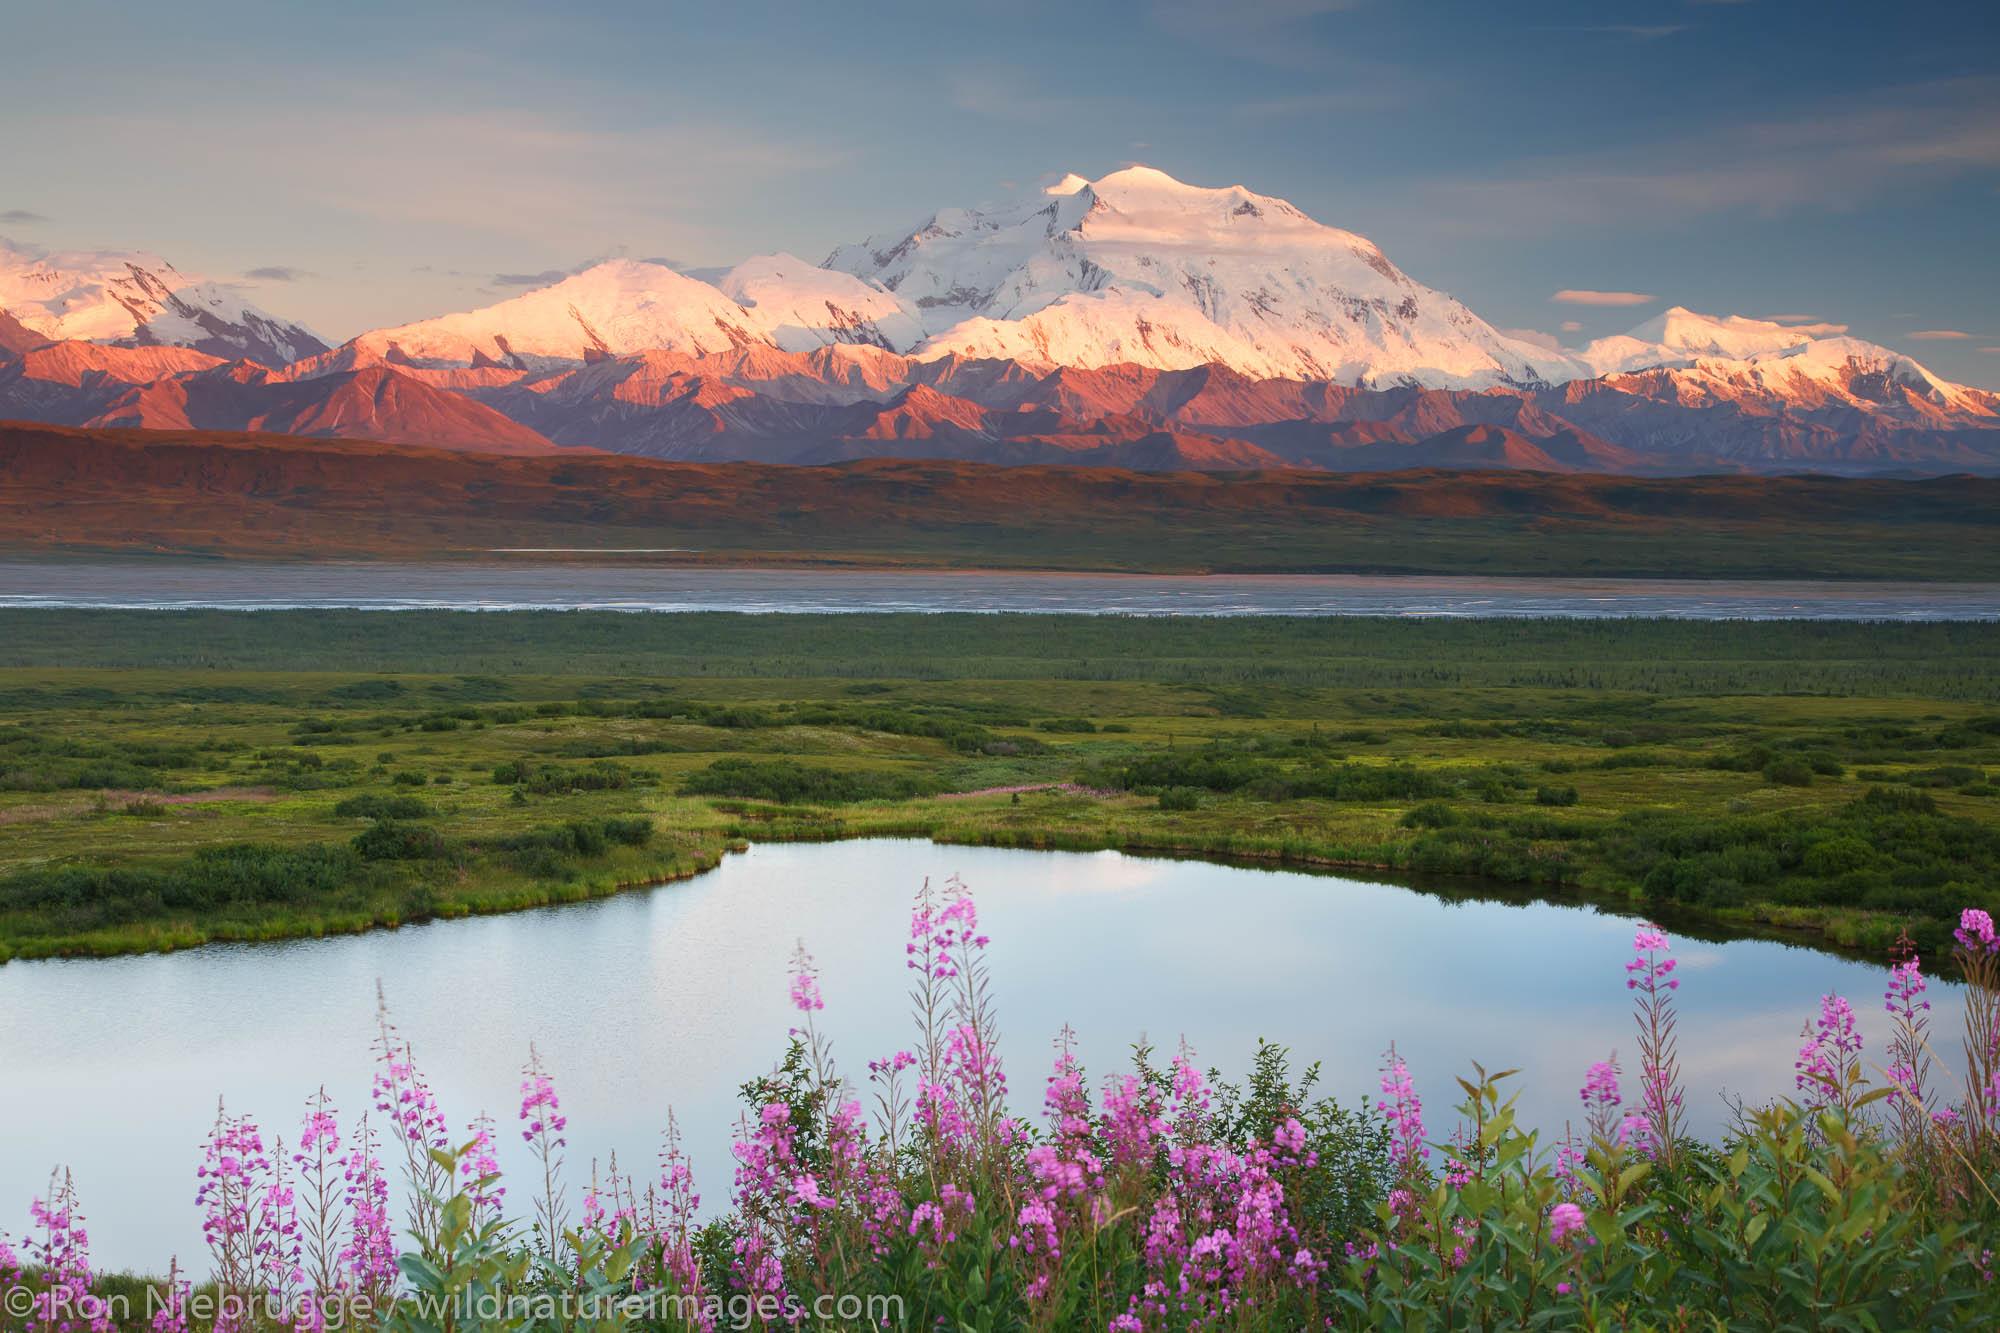 Mt. McKinley, also known as Denali, Denali National Park, Alaska.